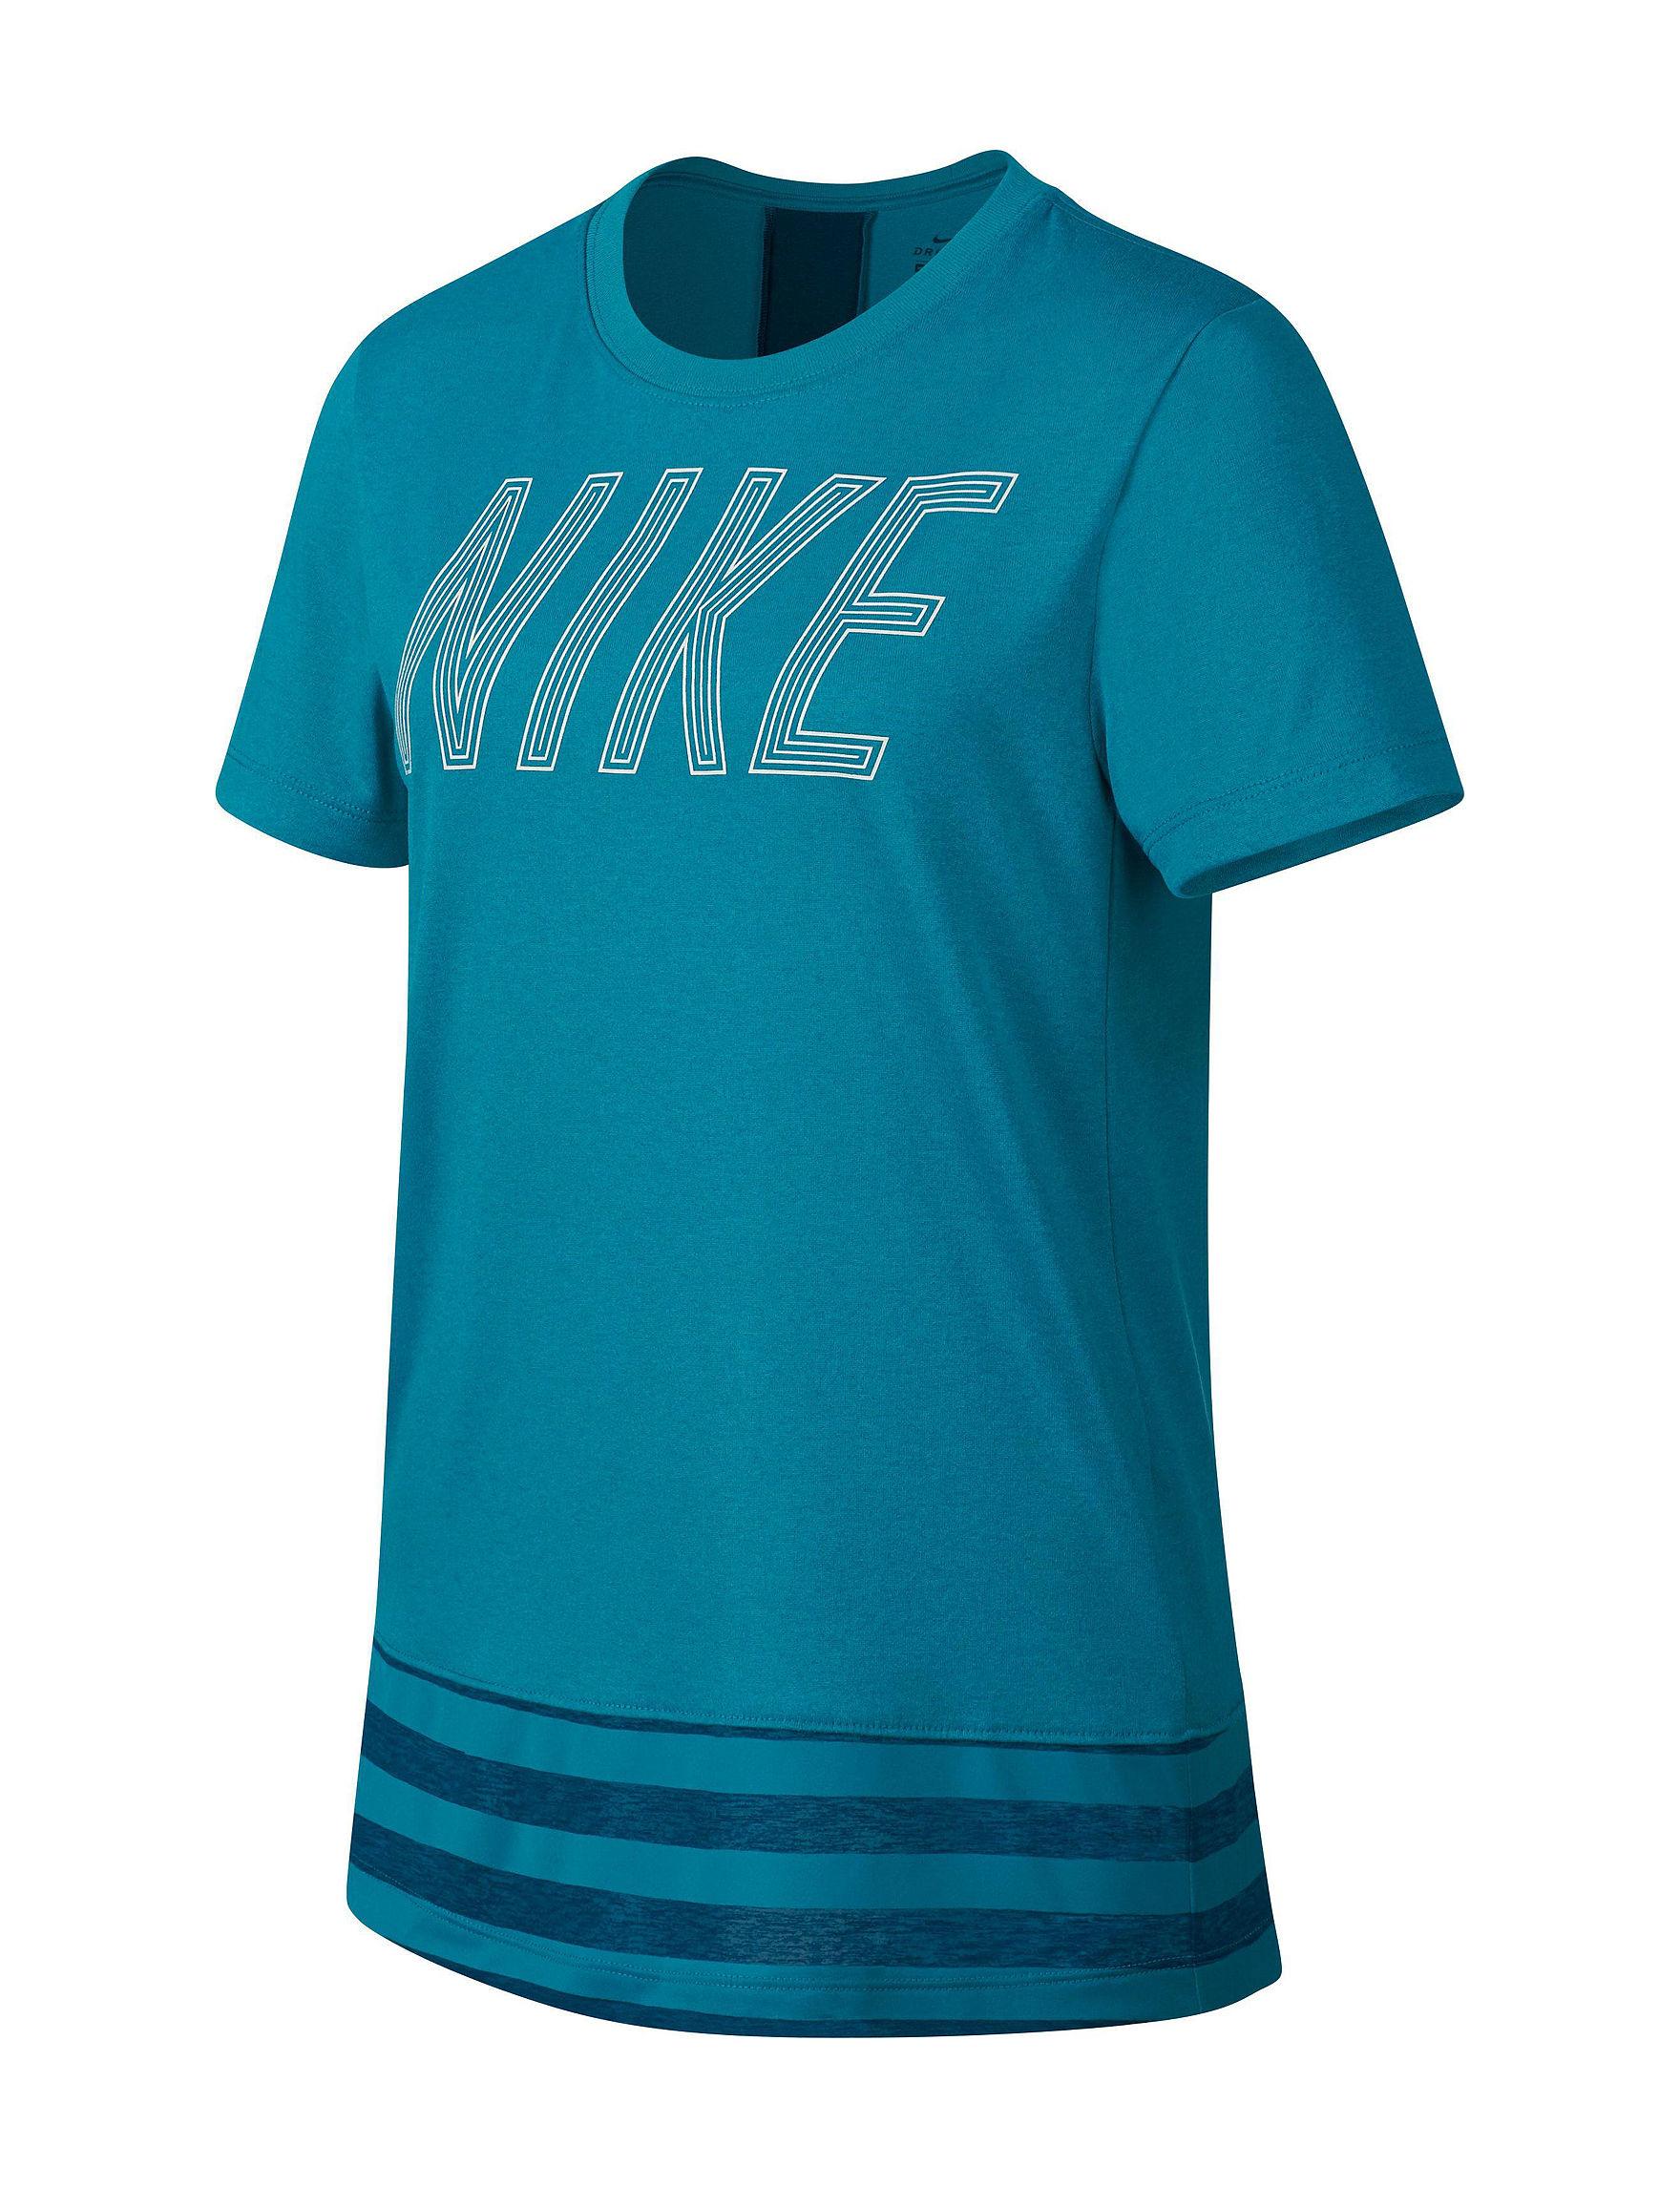 Nike Neon Blue Tees & Tanks